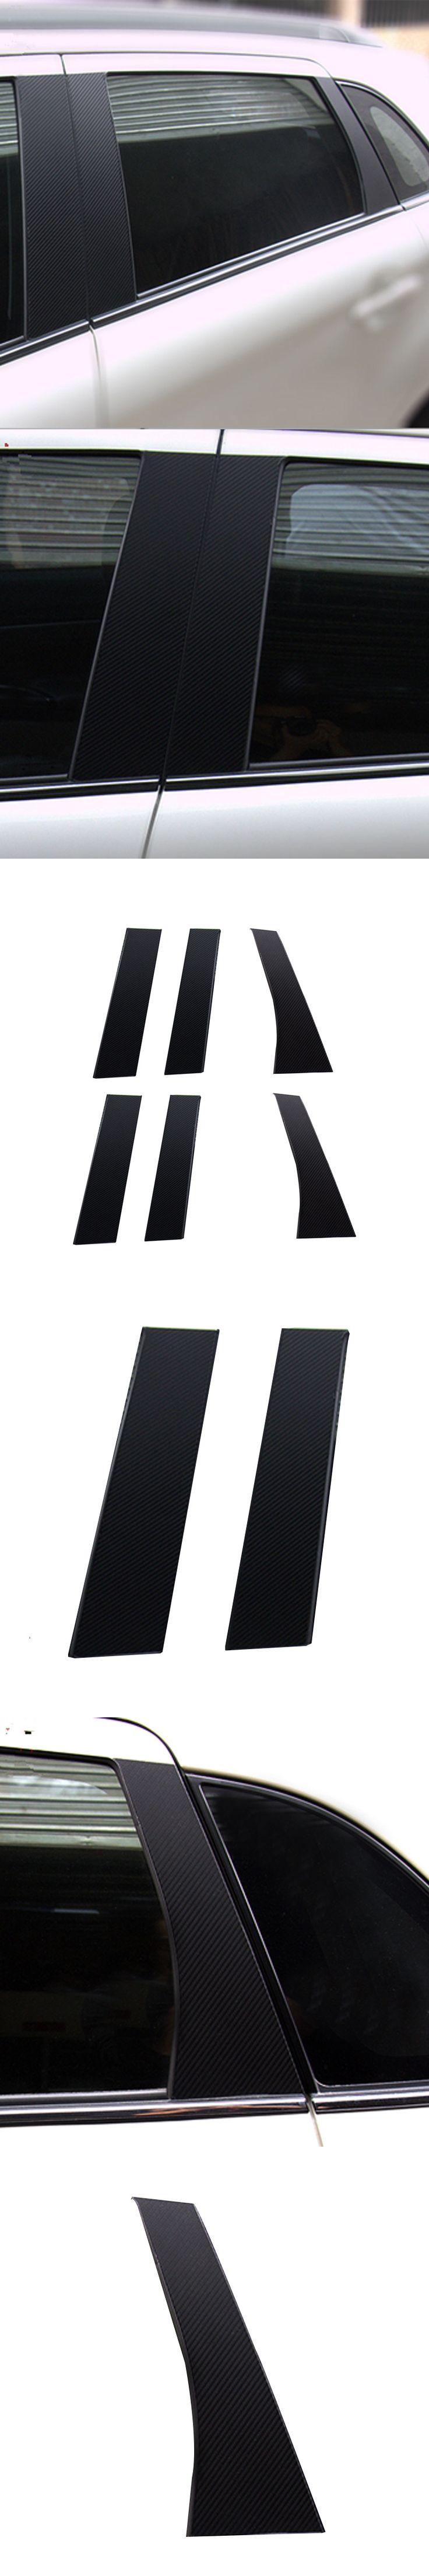 Yandex 6pcs Good Quality Car Column Carbon Fiber Stickers For MITSUBISHI ASX Accessories 2011 2012 2013 2014 2015 2016